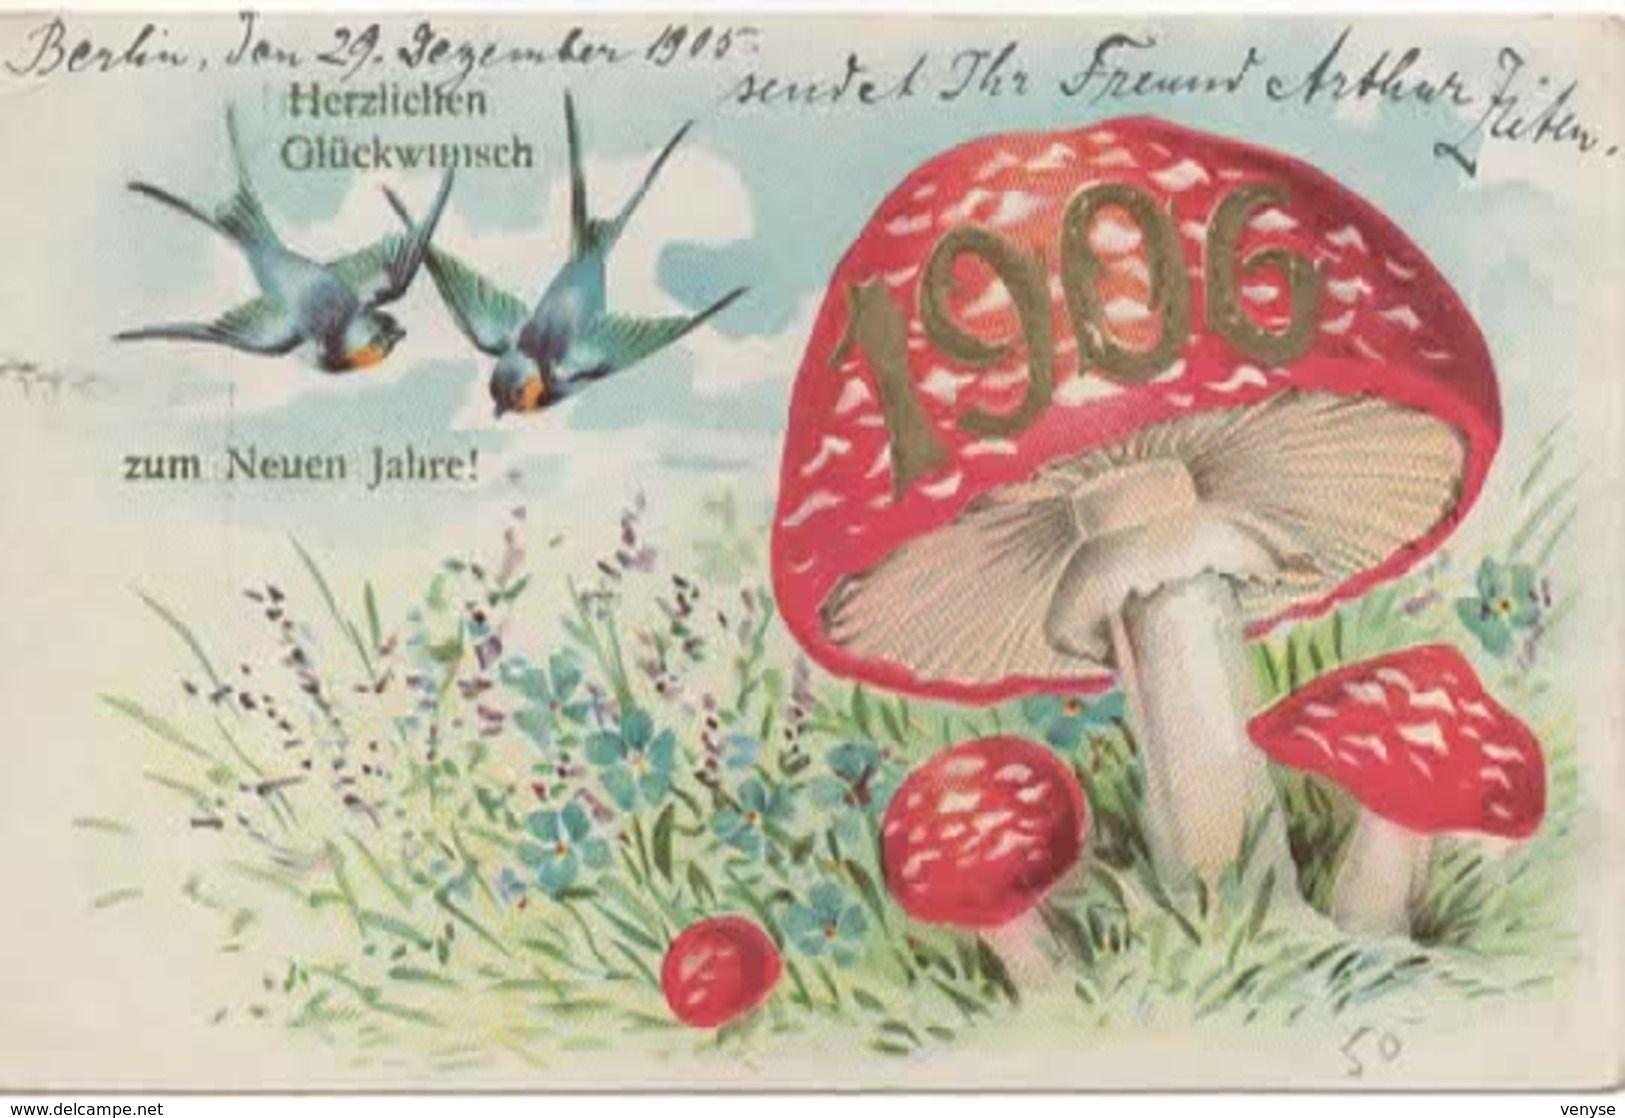 Pin by Helen on открытки два Christmas postcard, New